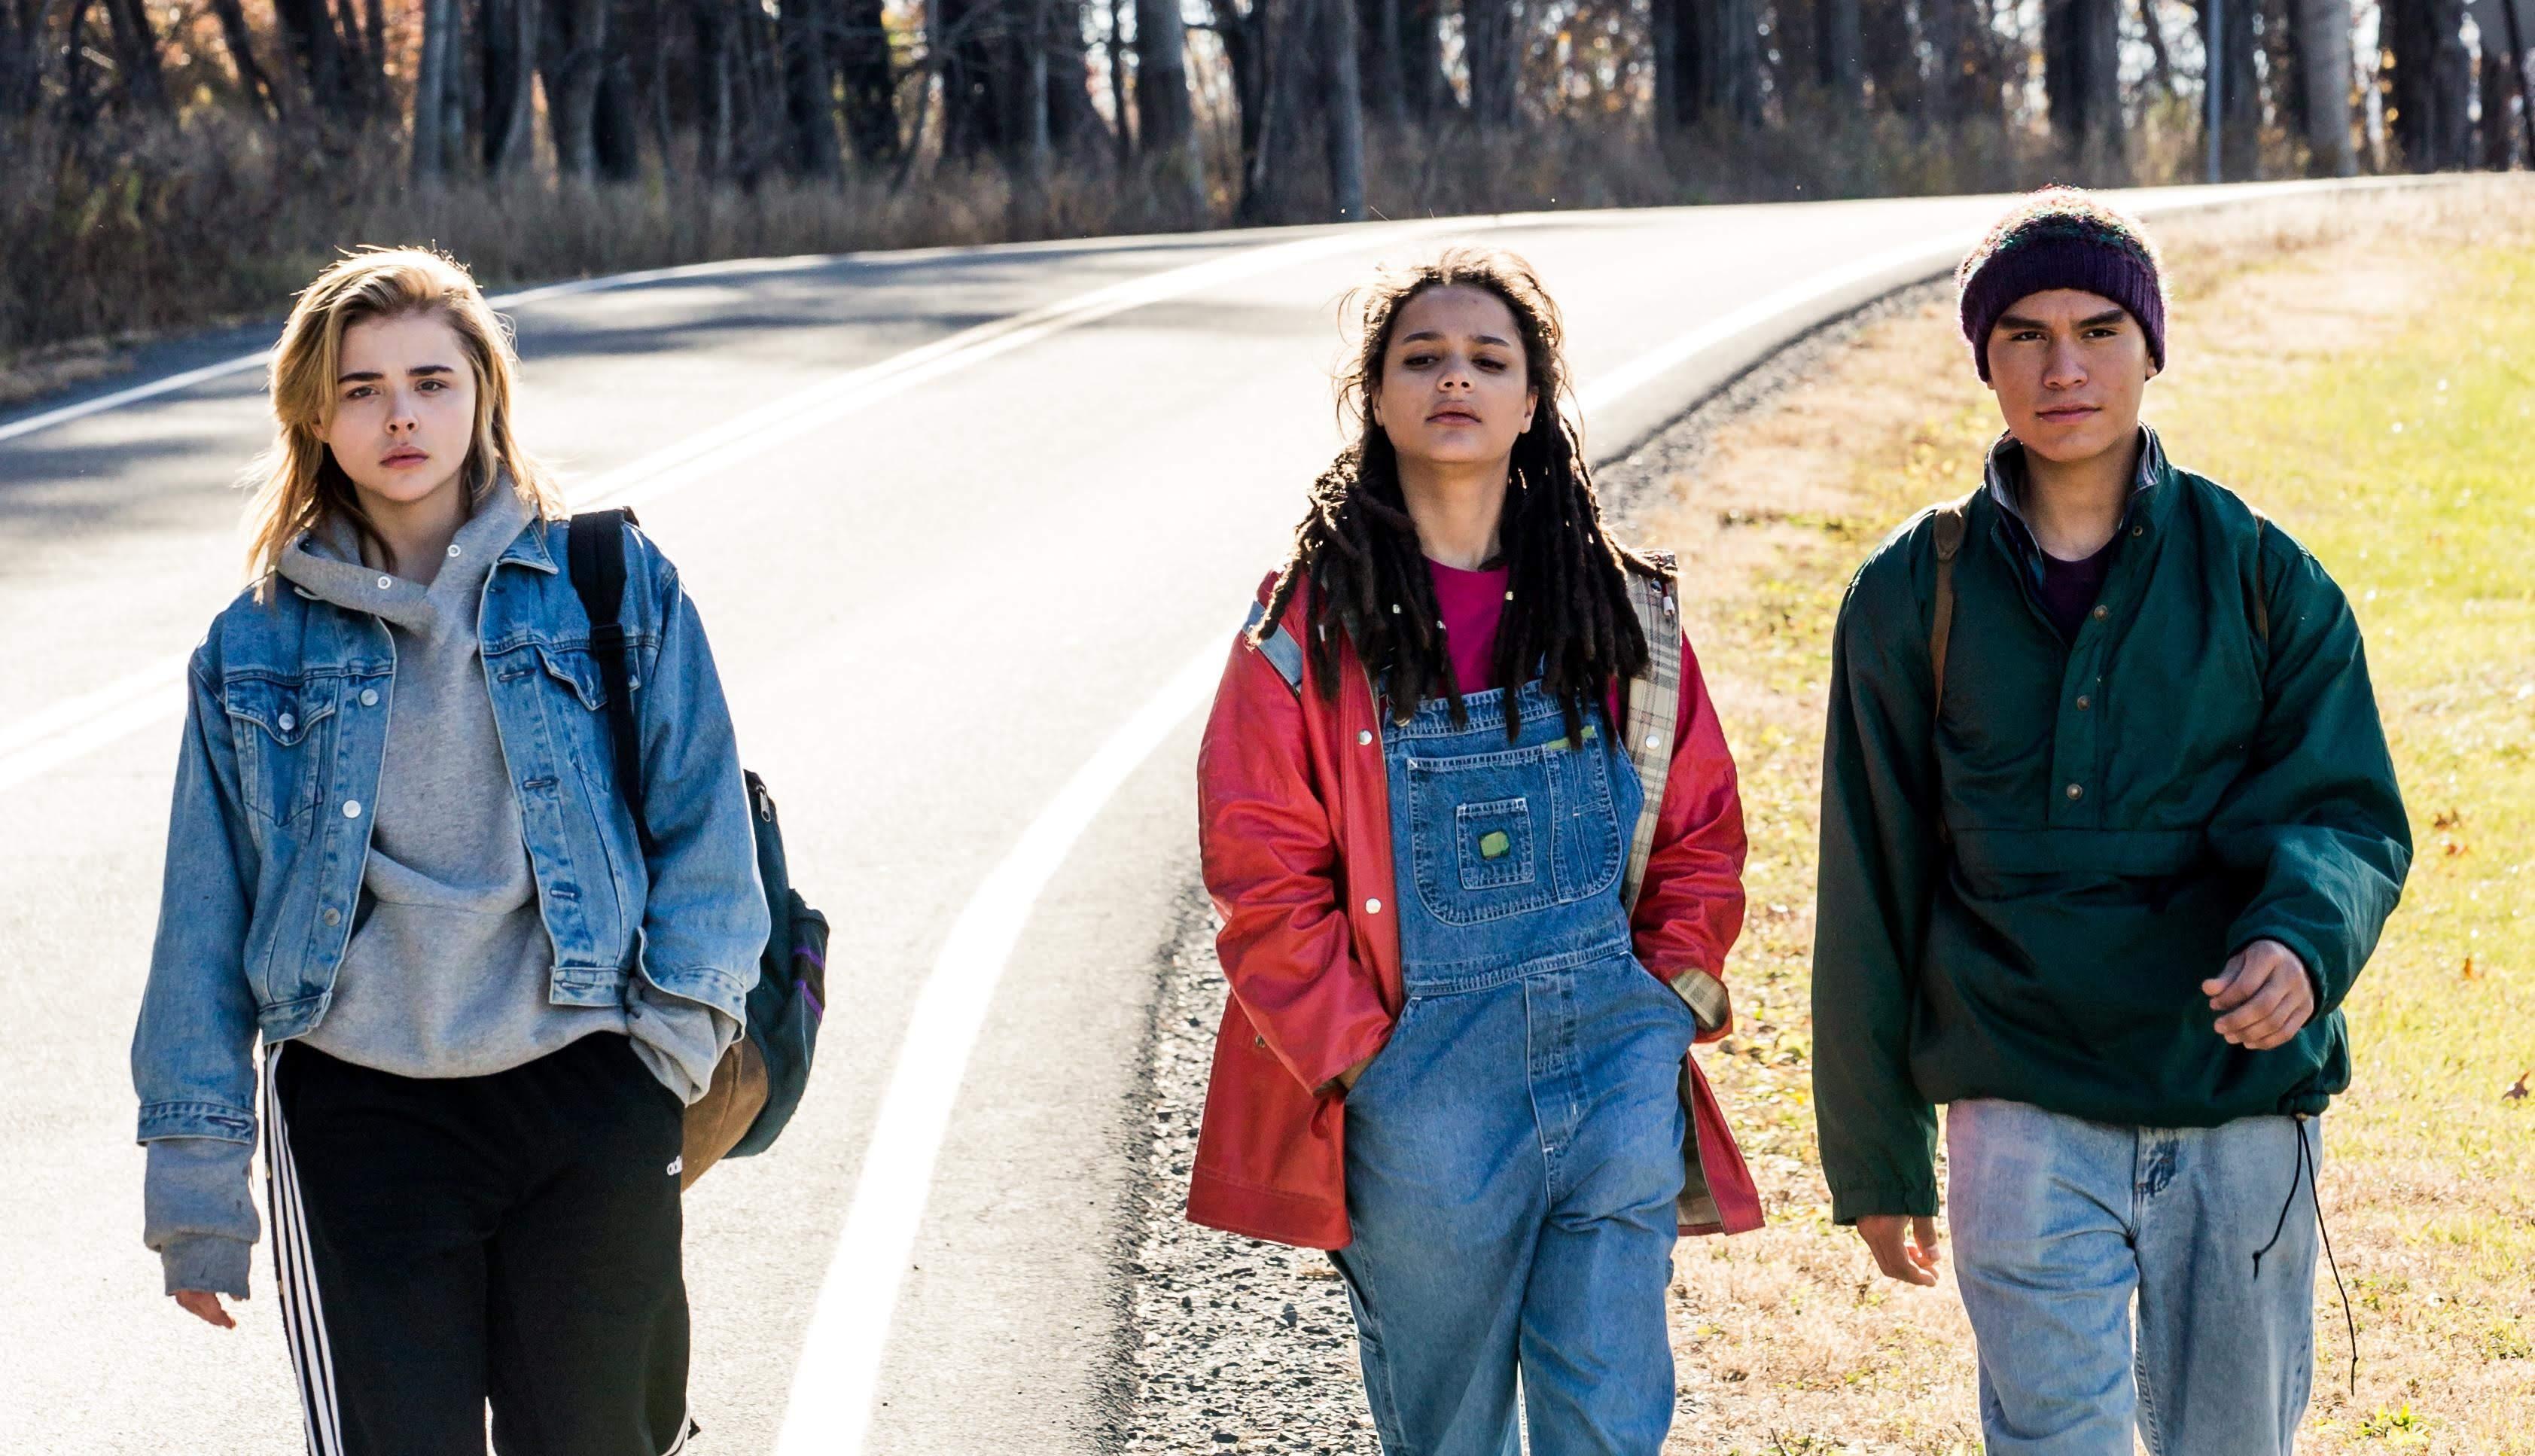 Movie Shopper's Guide - The Miseducation of Cameron Post : クロエ・モレッツちゃん主演の青春LGBTQIA映画「ザ・ミスエデュケイション・オブ・キャメロン・ポスト」の DVD が、新年2019年春の2月2日に発売 ! !